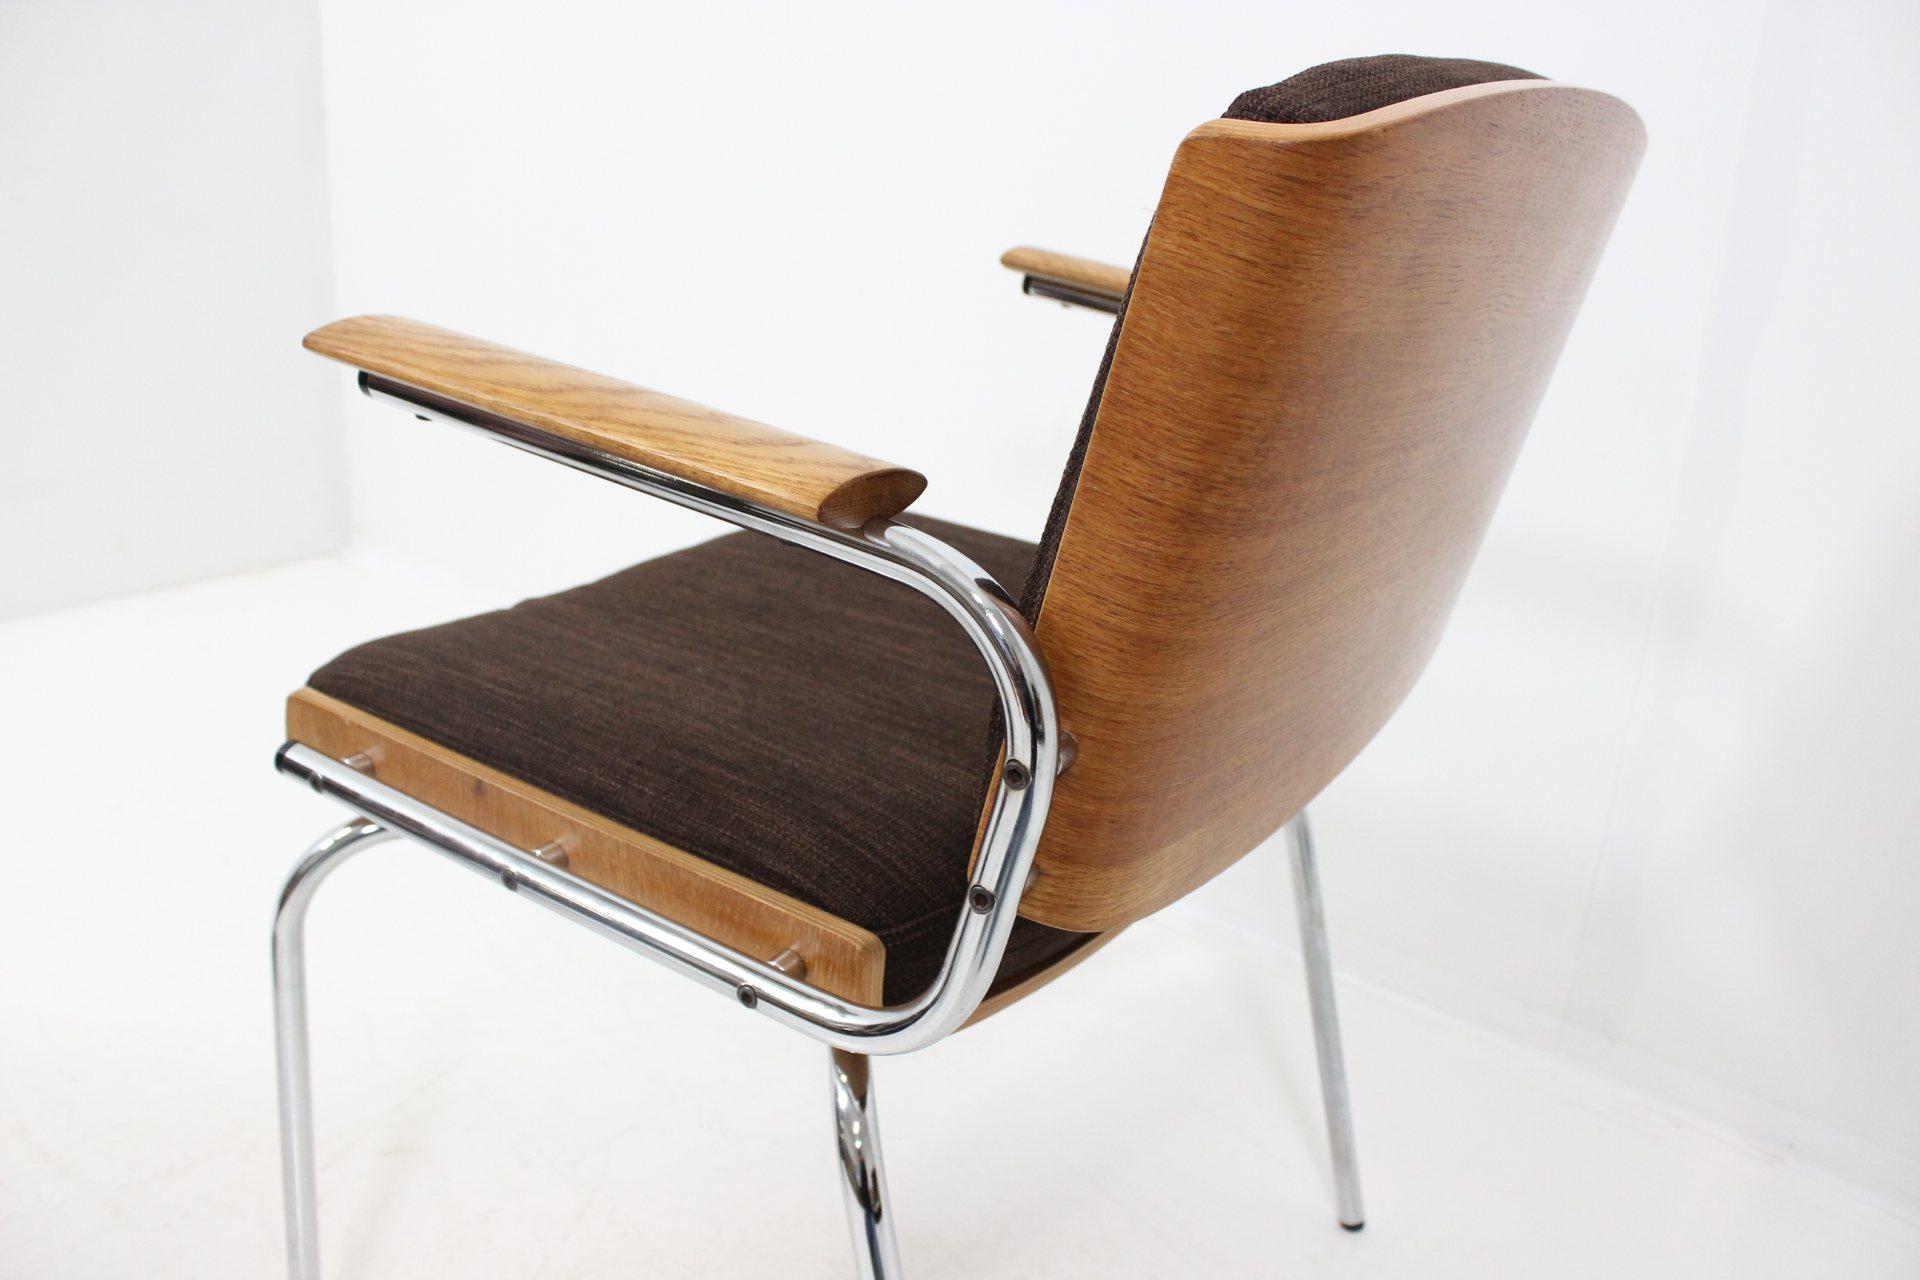 Vintage Retro Four Dining Chairs by Duba Møbelindustri